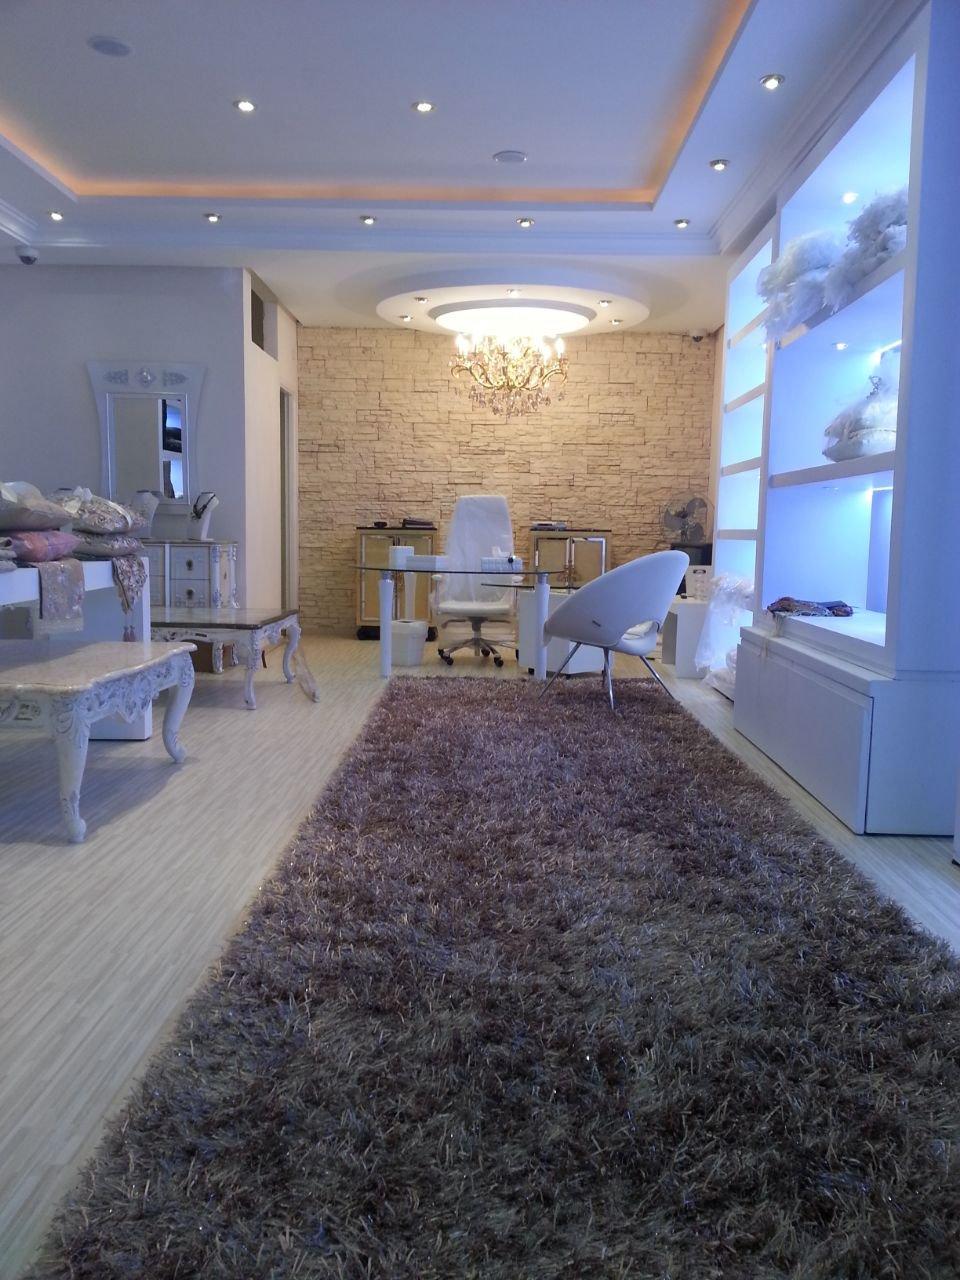 Rental Premises - La Marsa Sidi Daoud - Tunisia